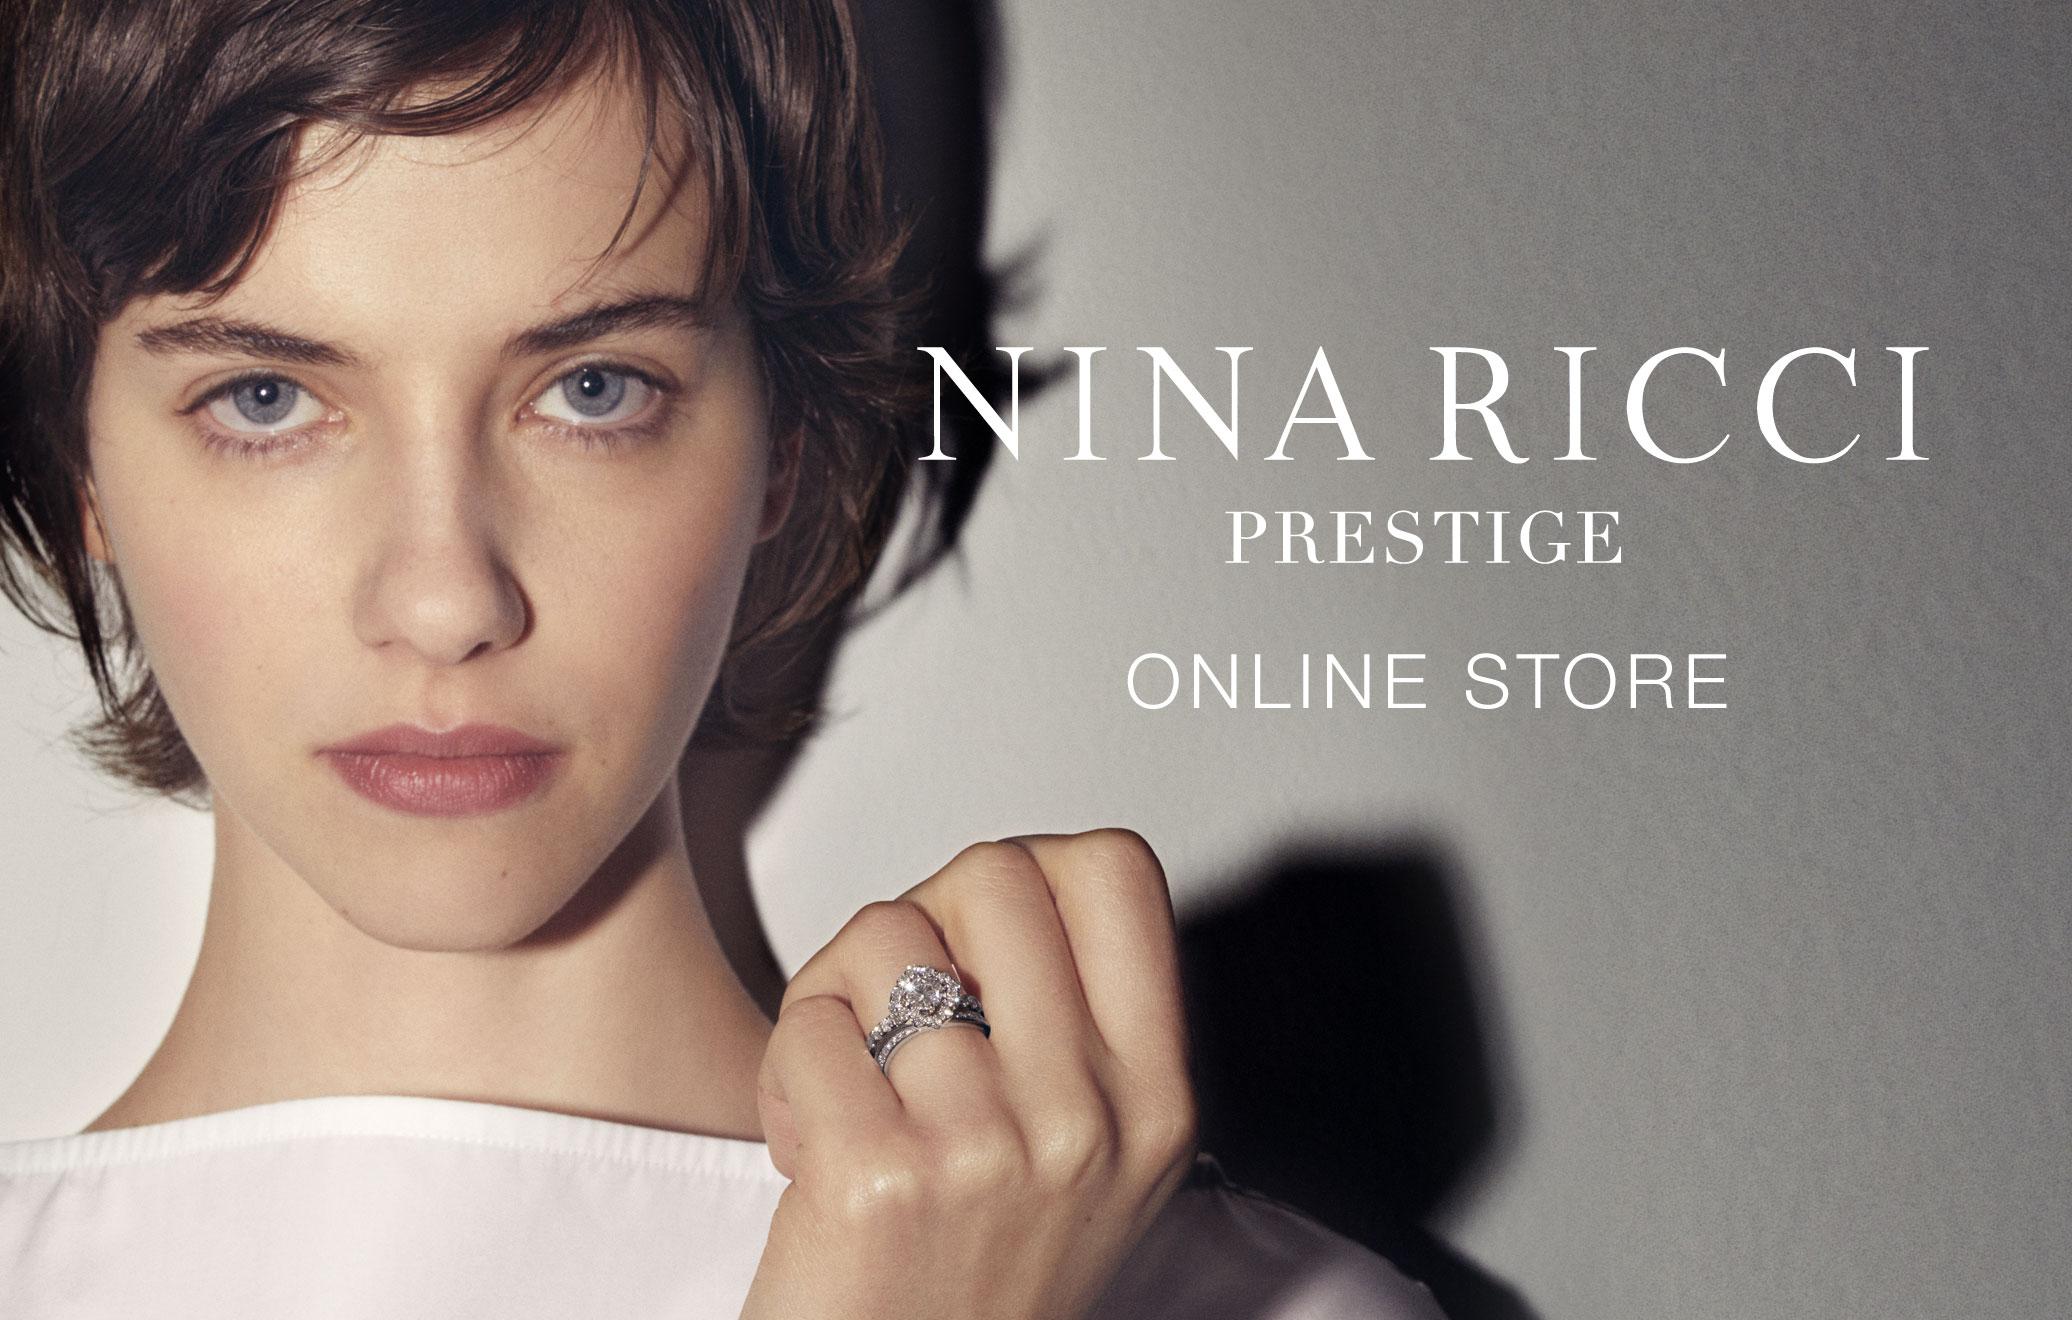 NINA RICCI PRESTIGE ONLINE STORE